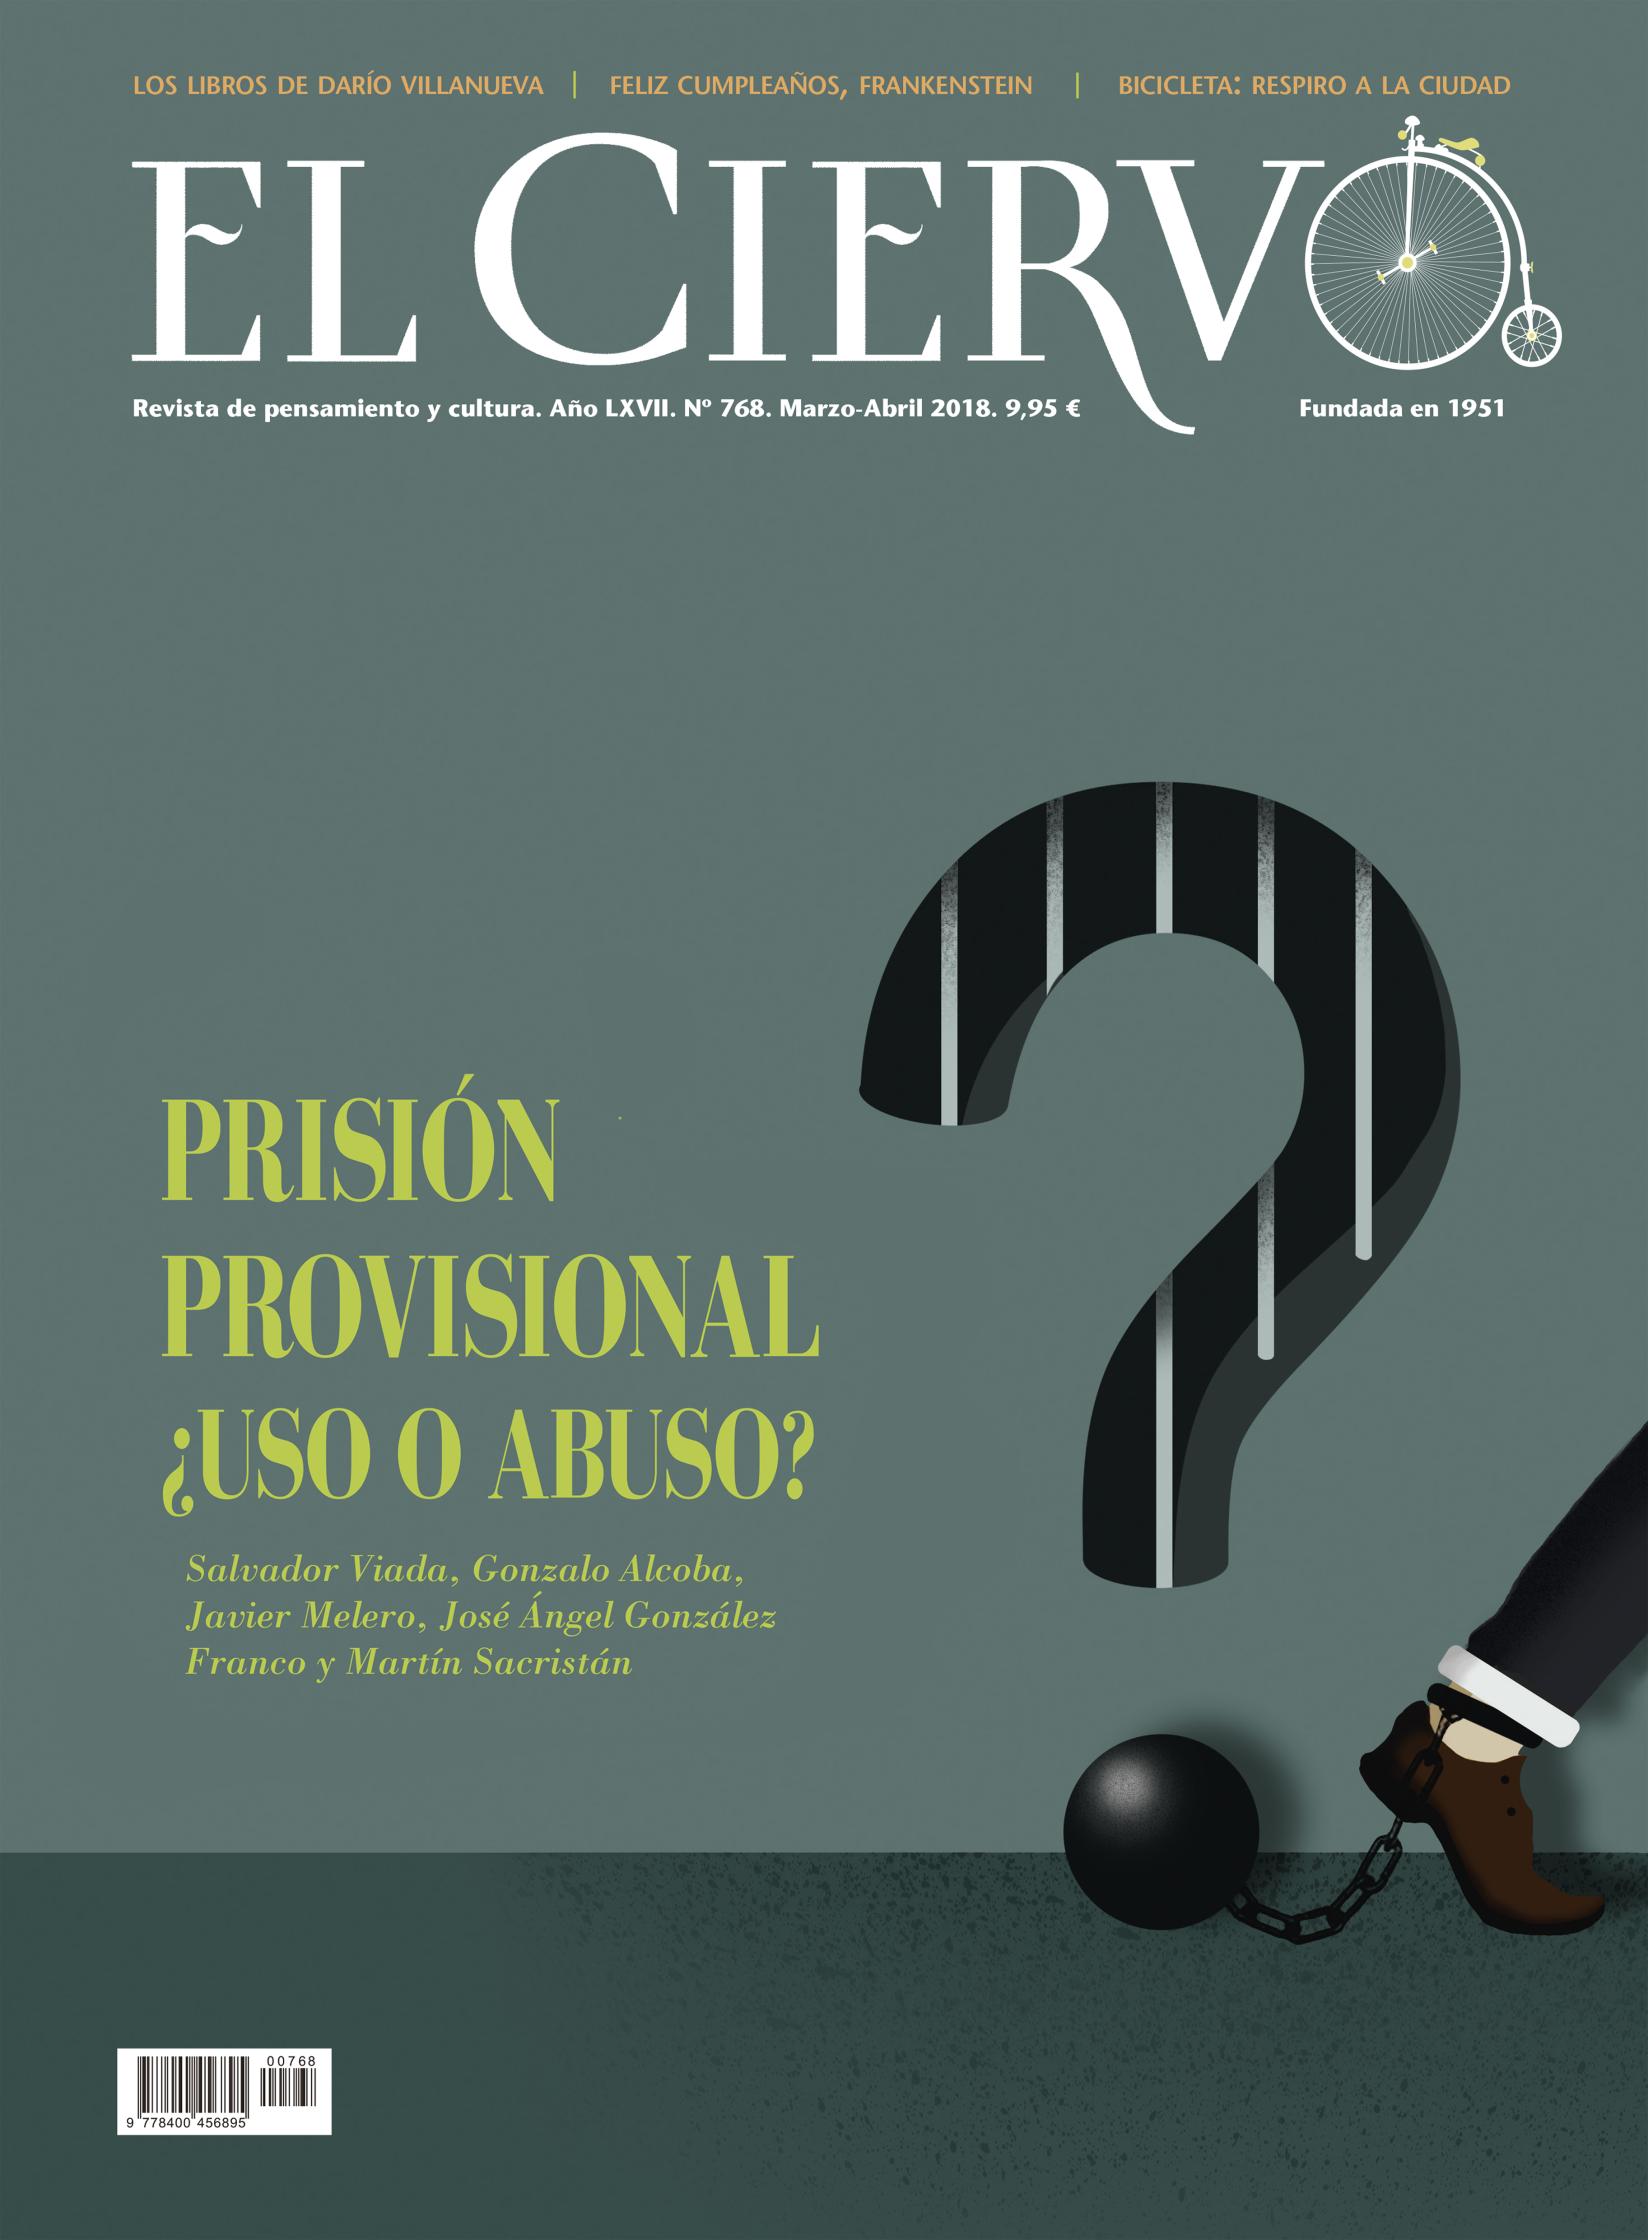 Cover for El Ciervo Magazine.jpg